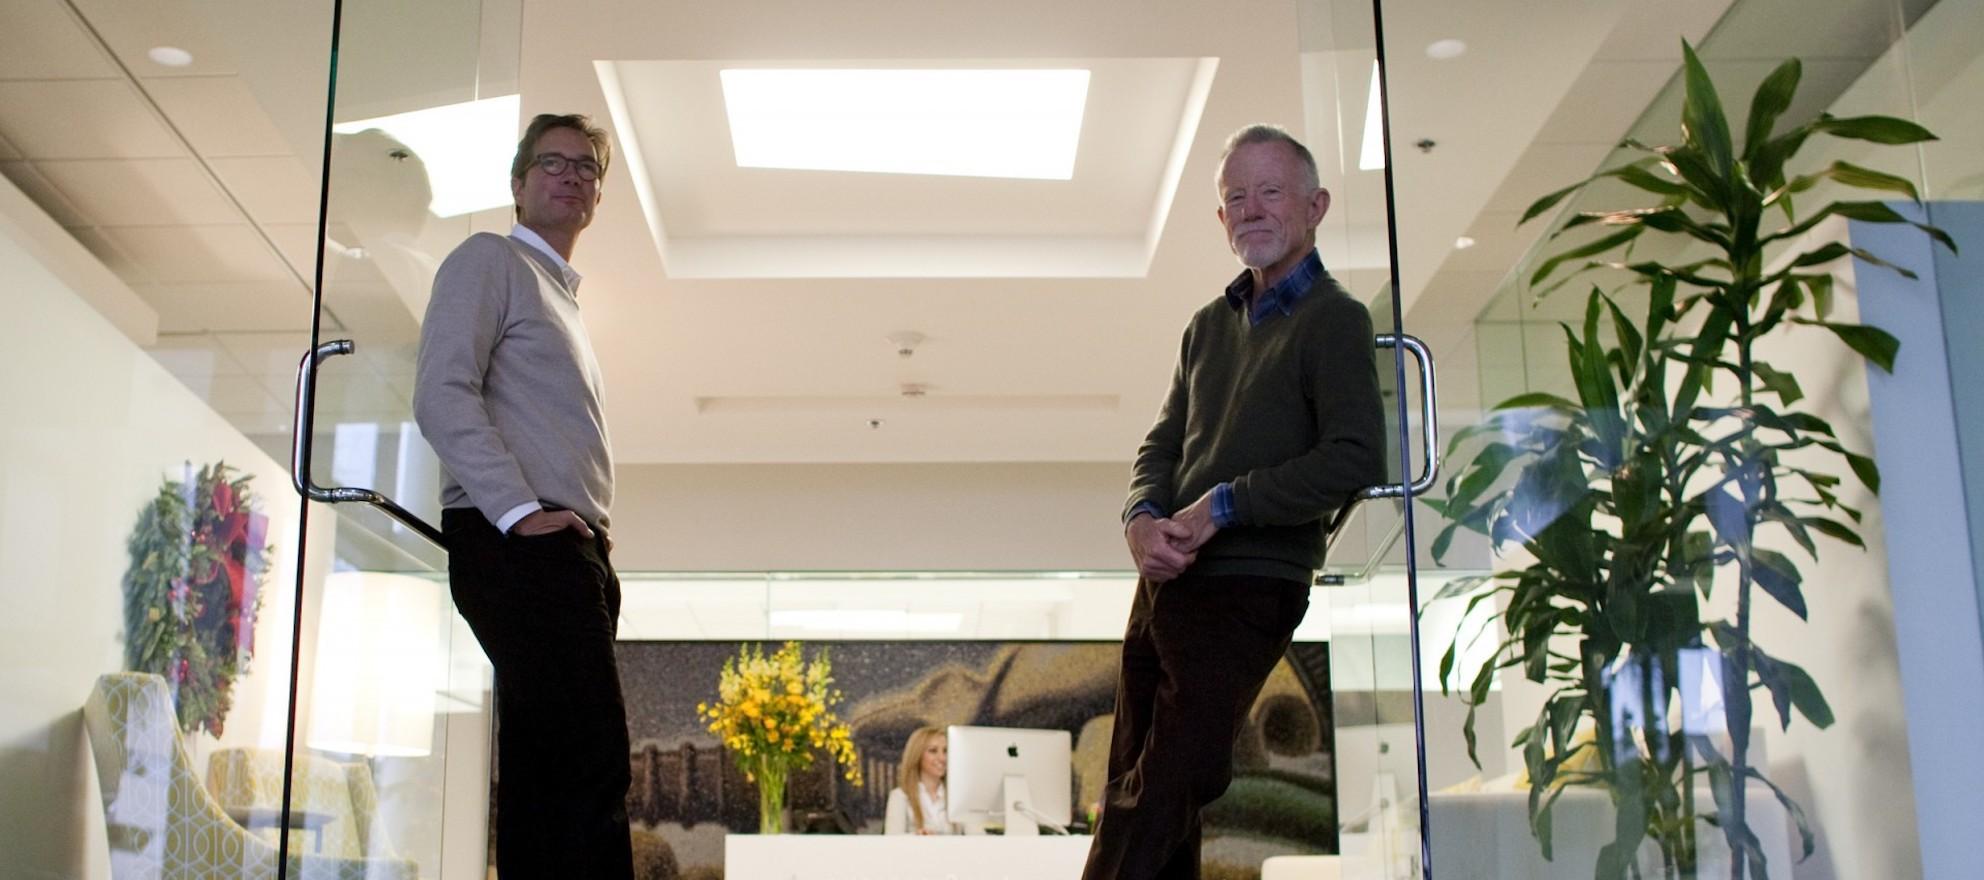 Design-focused indie brokerage Deasy/Penner acquires Podley Properties